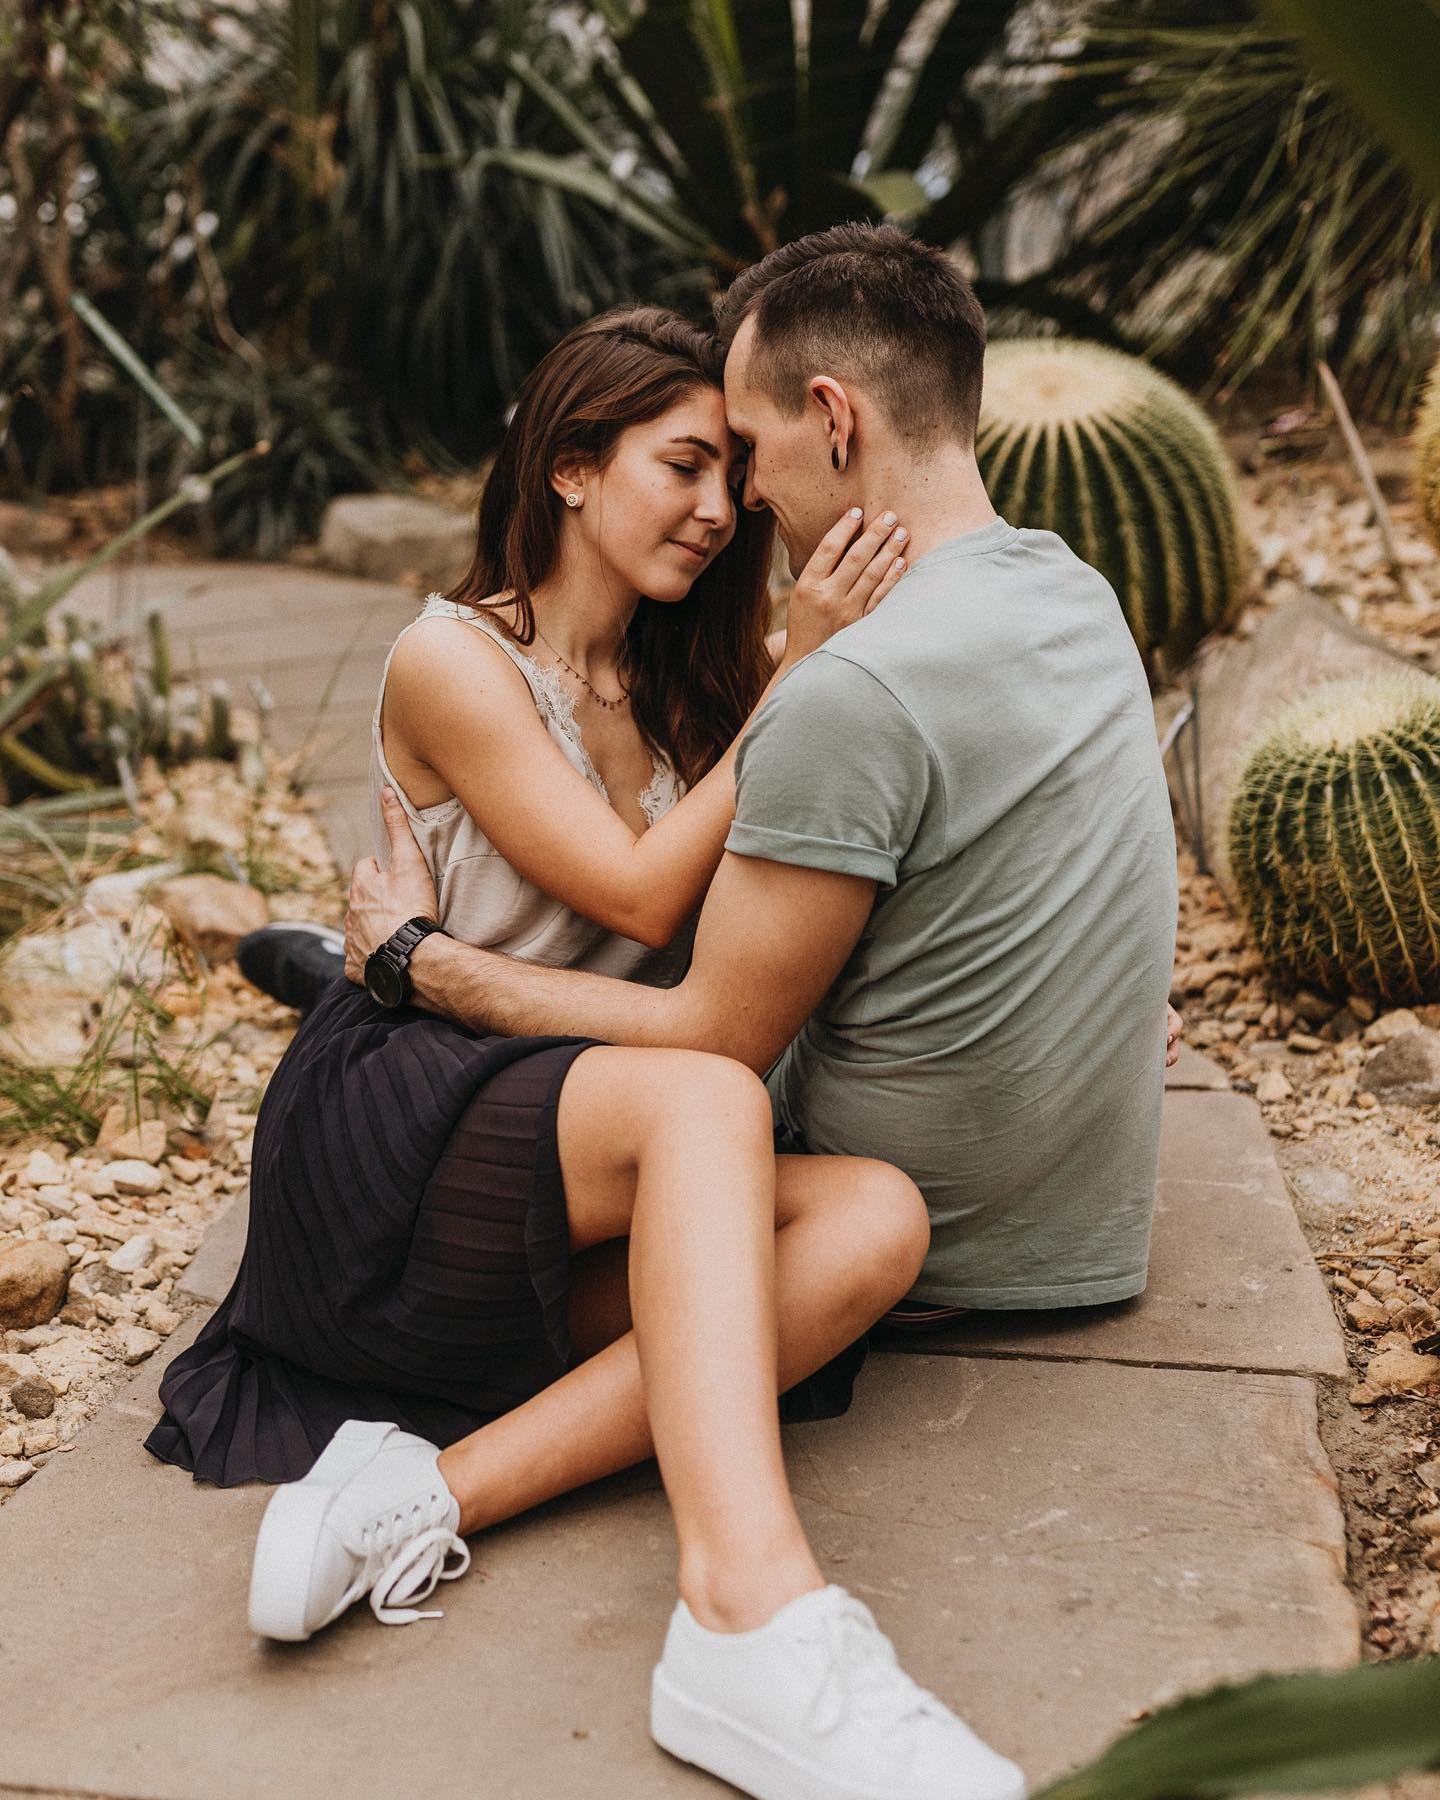 Pin On Weddings Couples